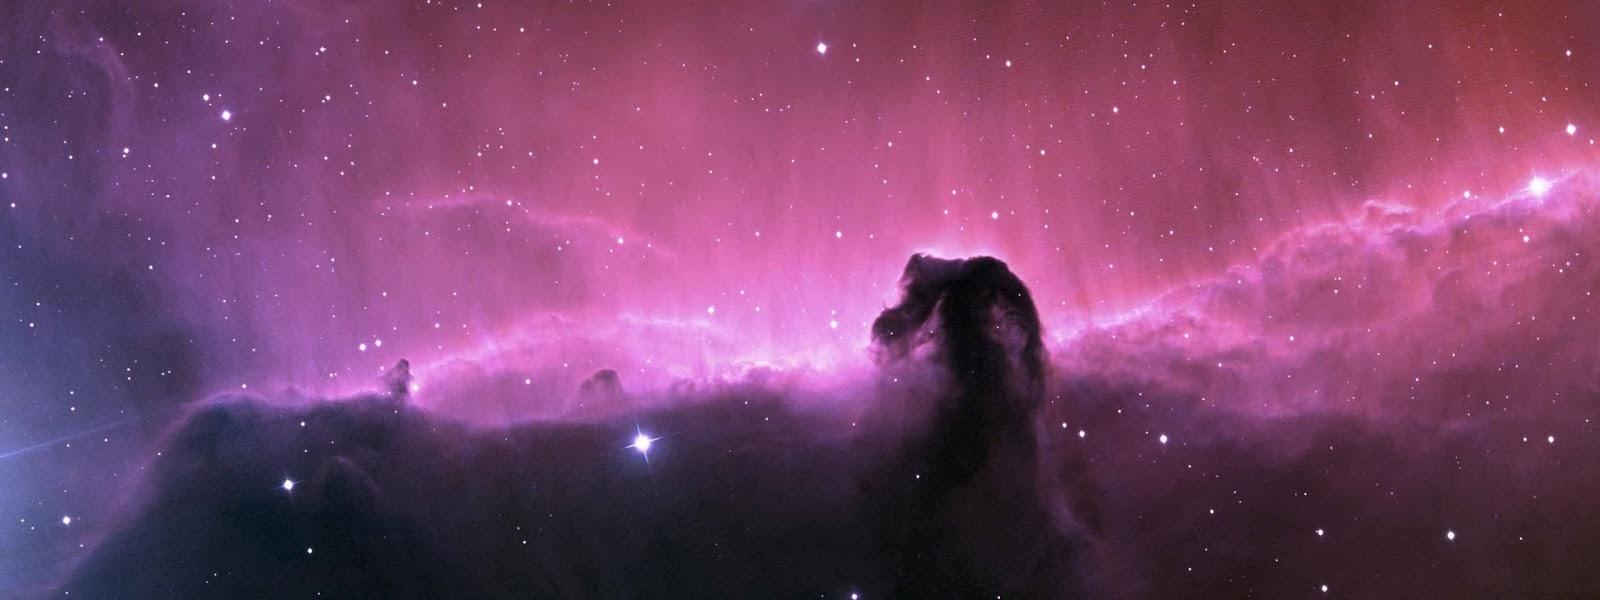 Good   Wallpaper Horse Nebula - Horsehead-Nebula-Wallpaper-HD-11  You Should Have_152118.jpg